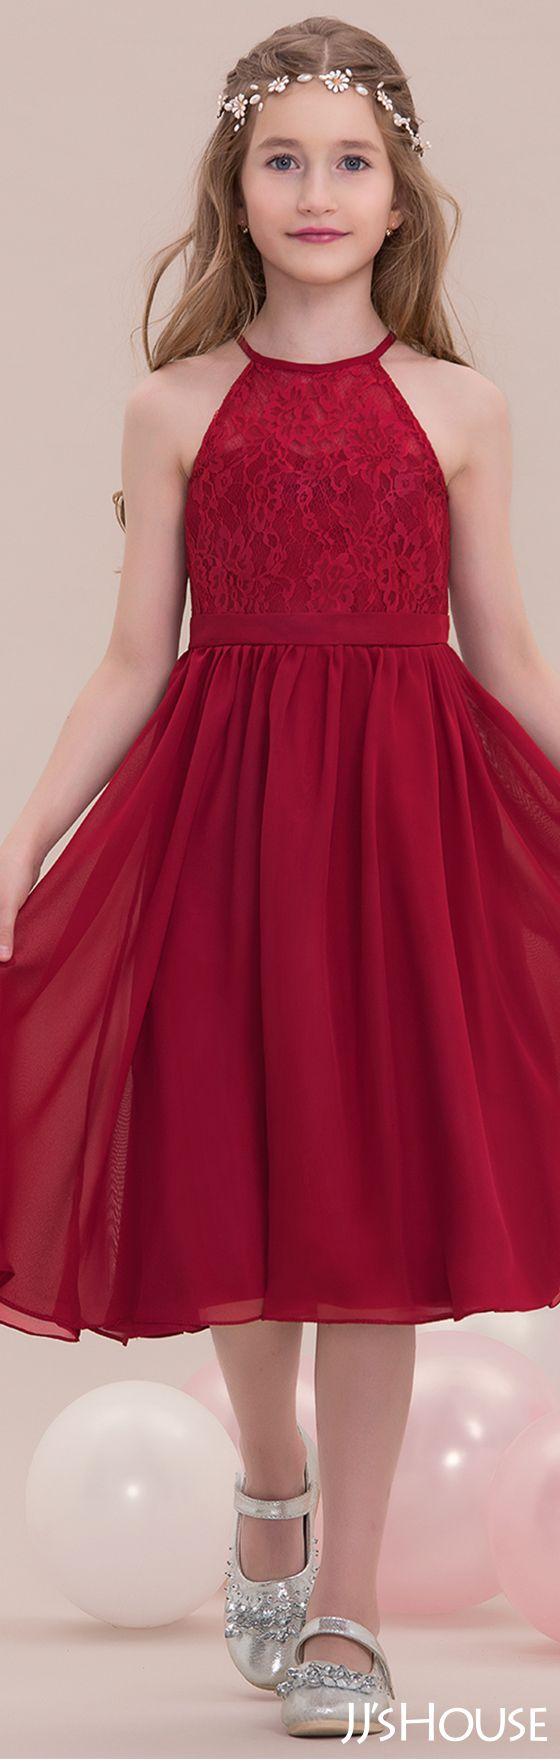 What an amazing dress! #Junior #Bridesmaid | SHARIEL | Pinterest ...